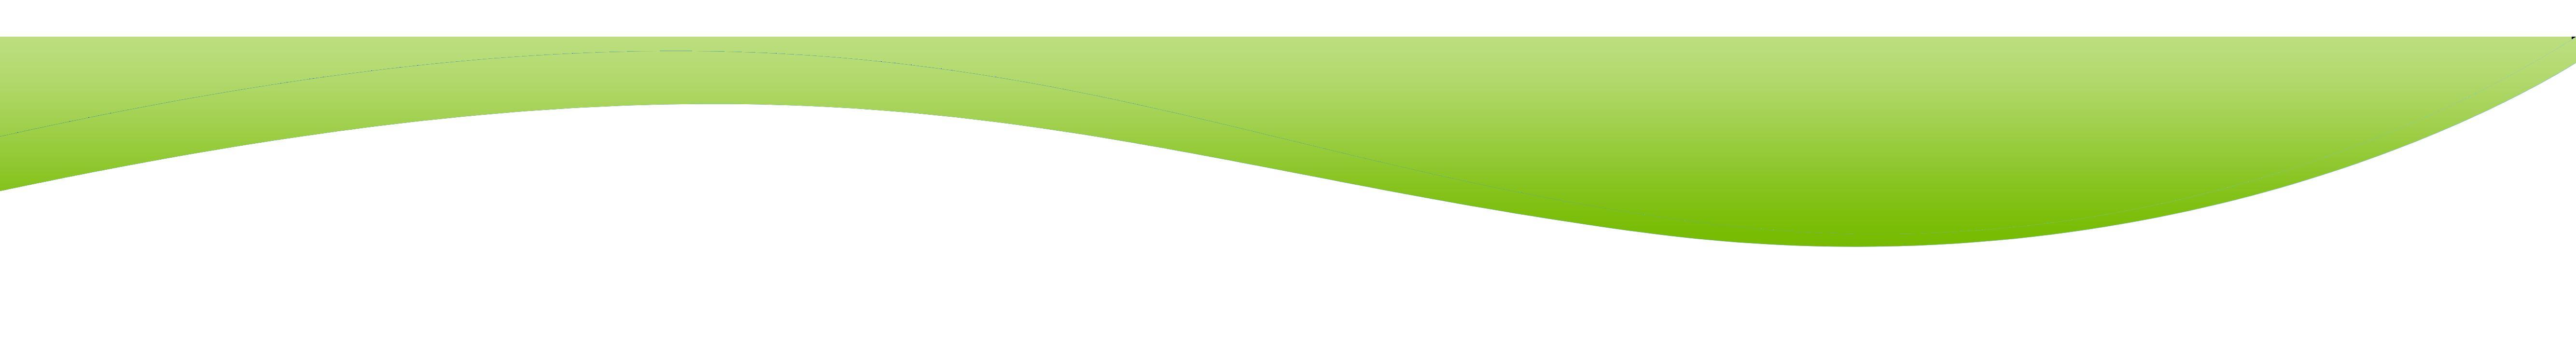 green cruve